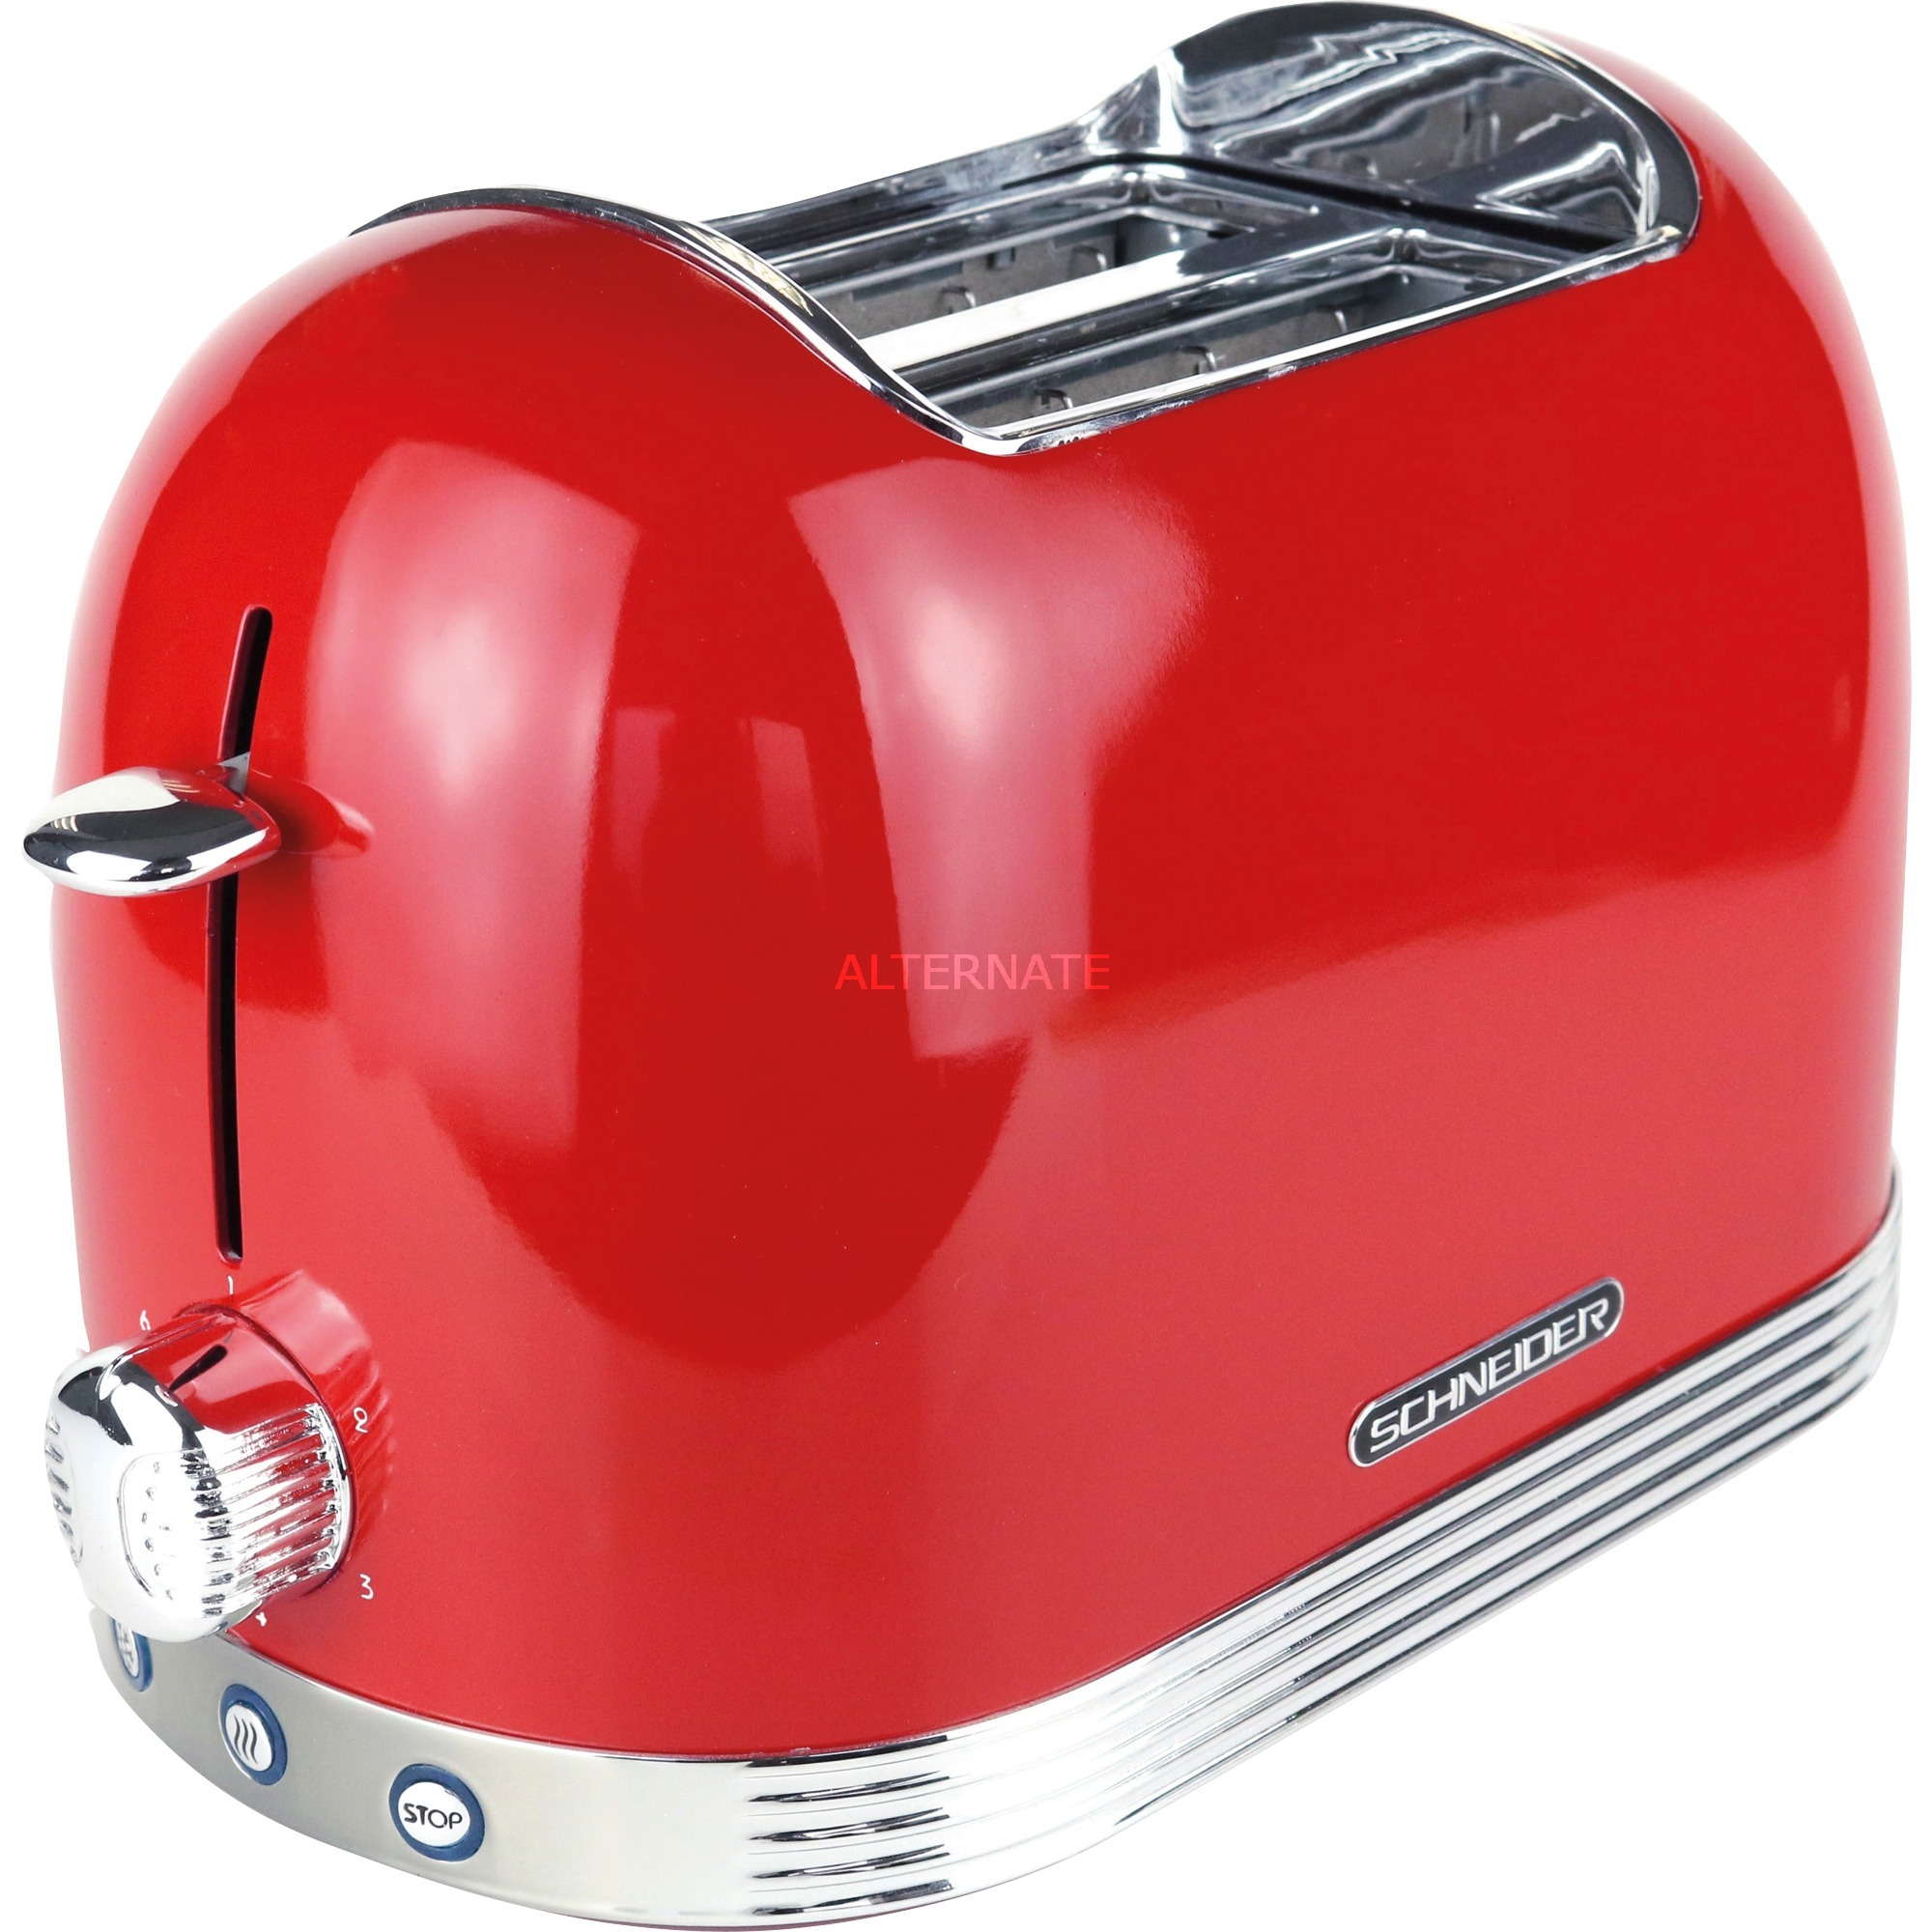 SL T2.2 FR tostadora 2 rebanada(s) Rojo 850 W